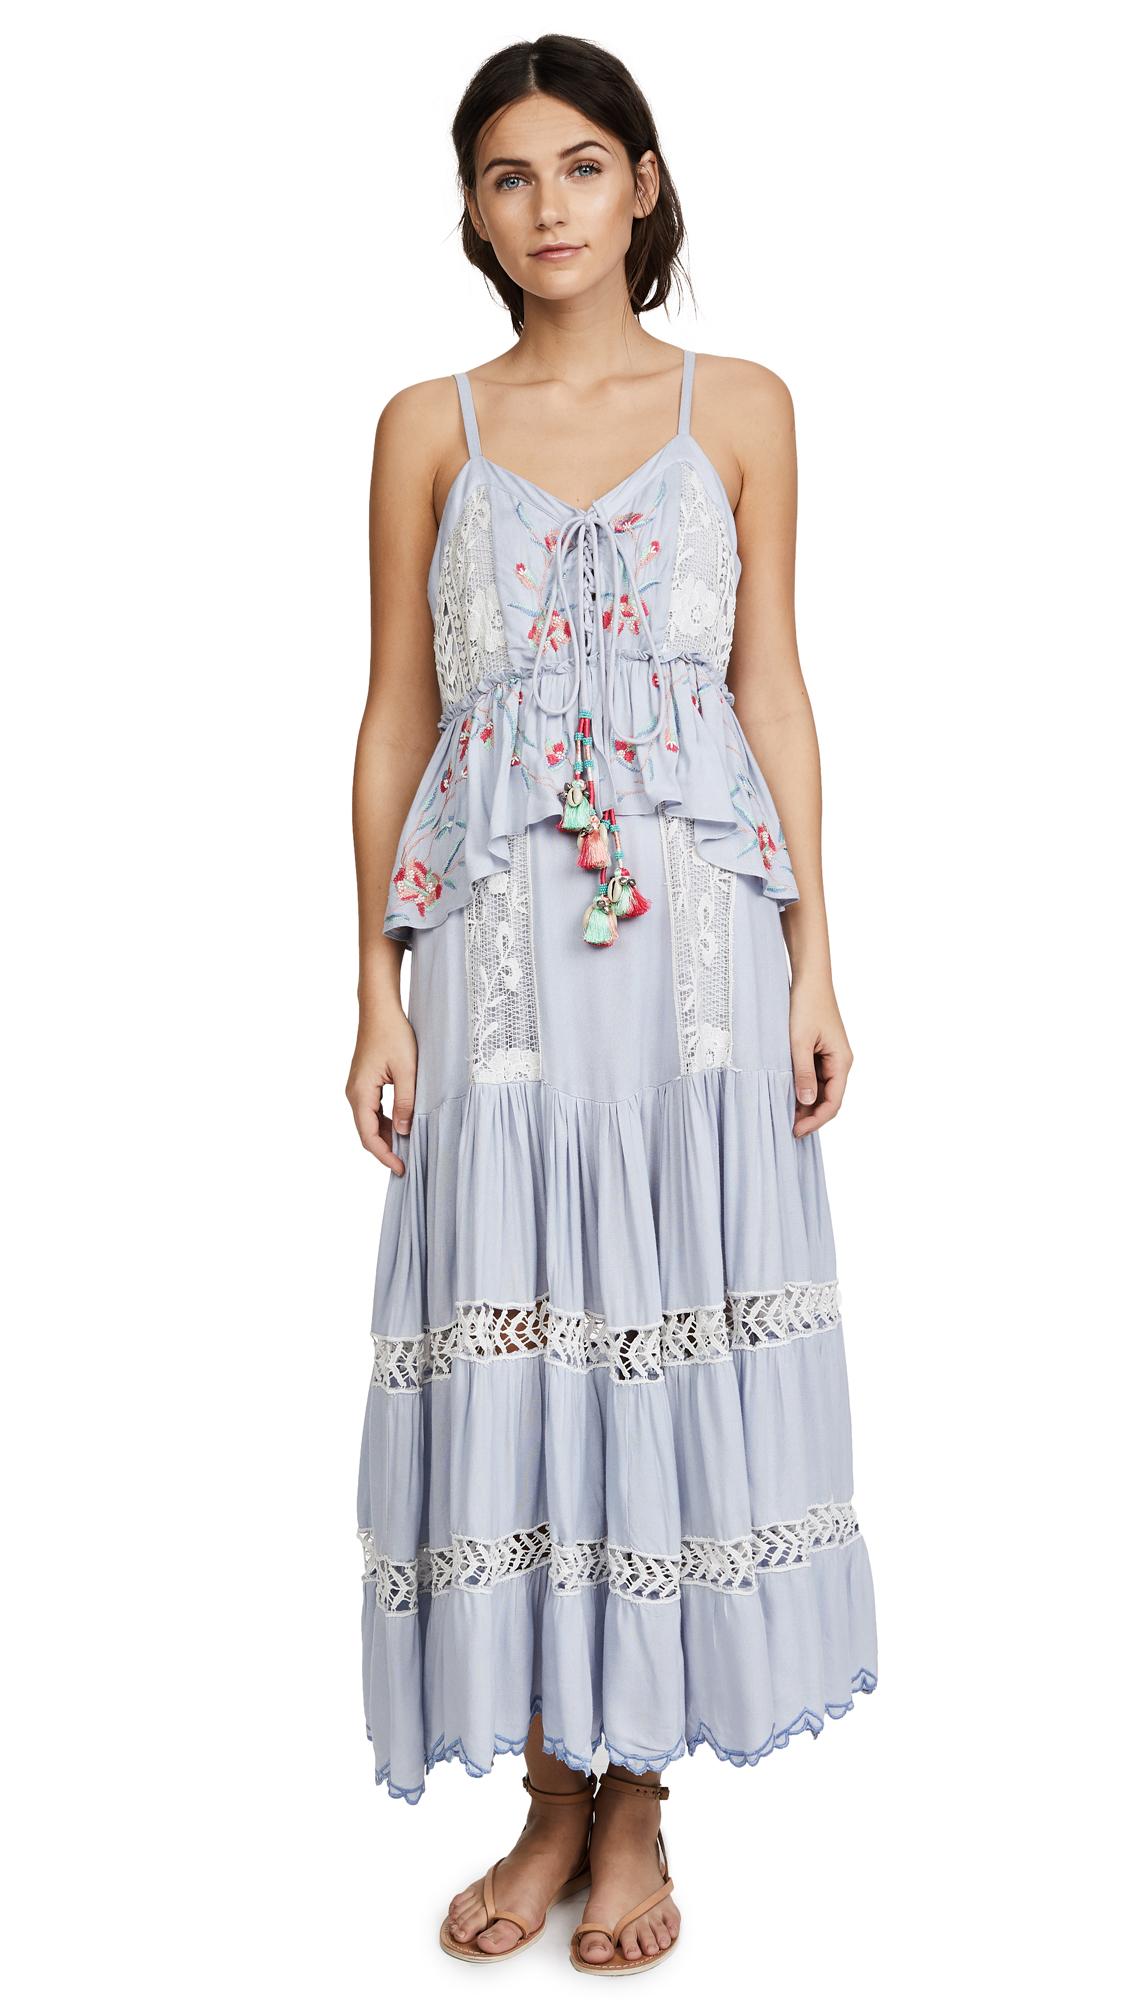 Hemant and Nandita Lodhi Dress